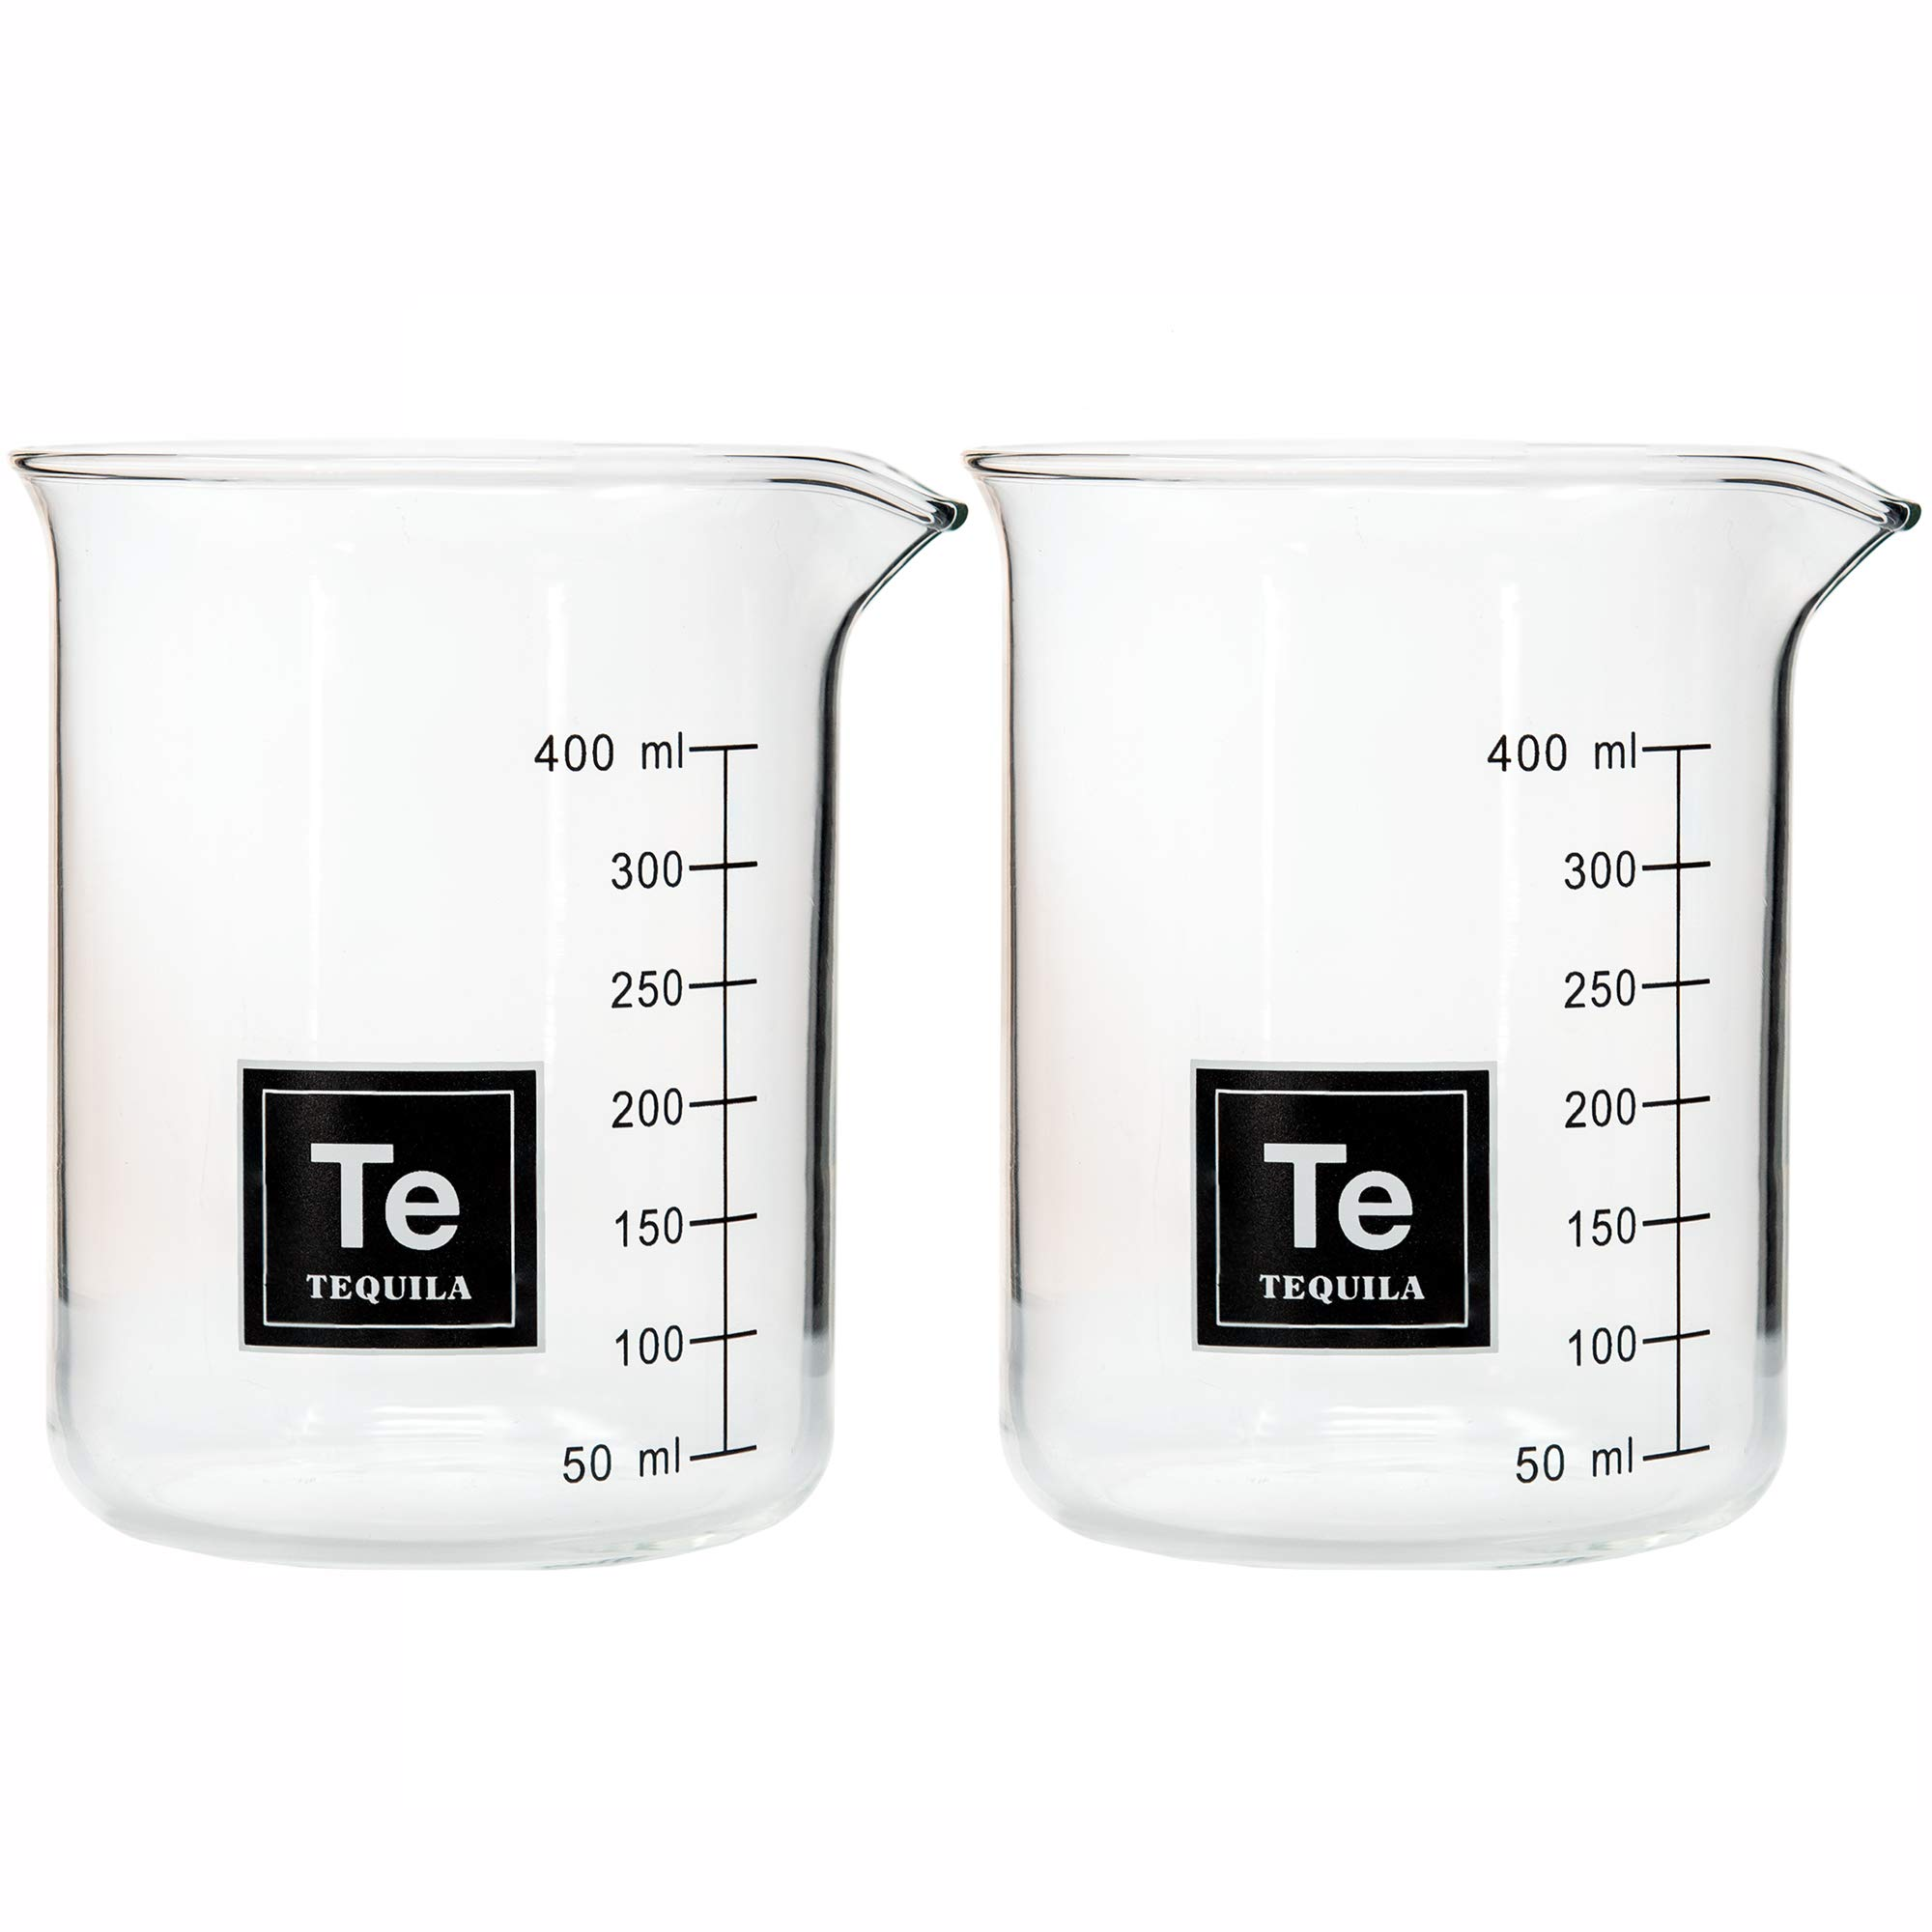 Drink Periodically Set of 2 Laboratory Beaker Tequila Glasses-16oz each short glasses